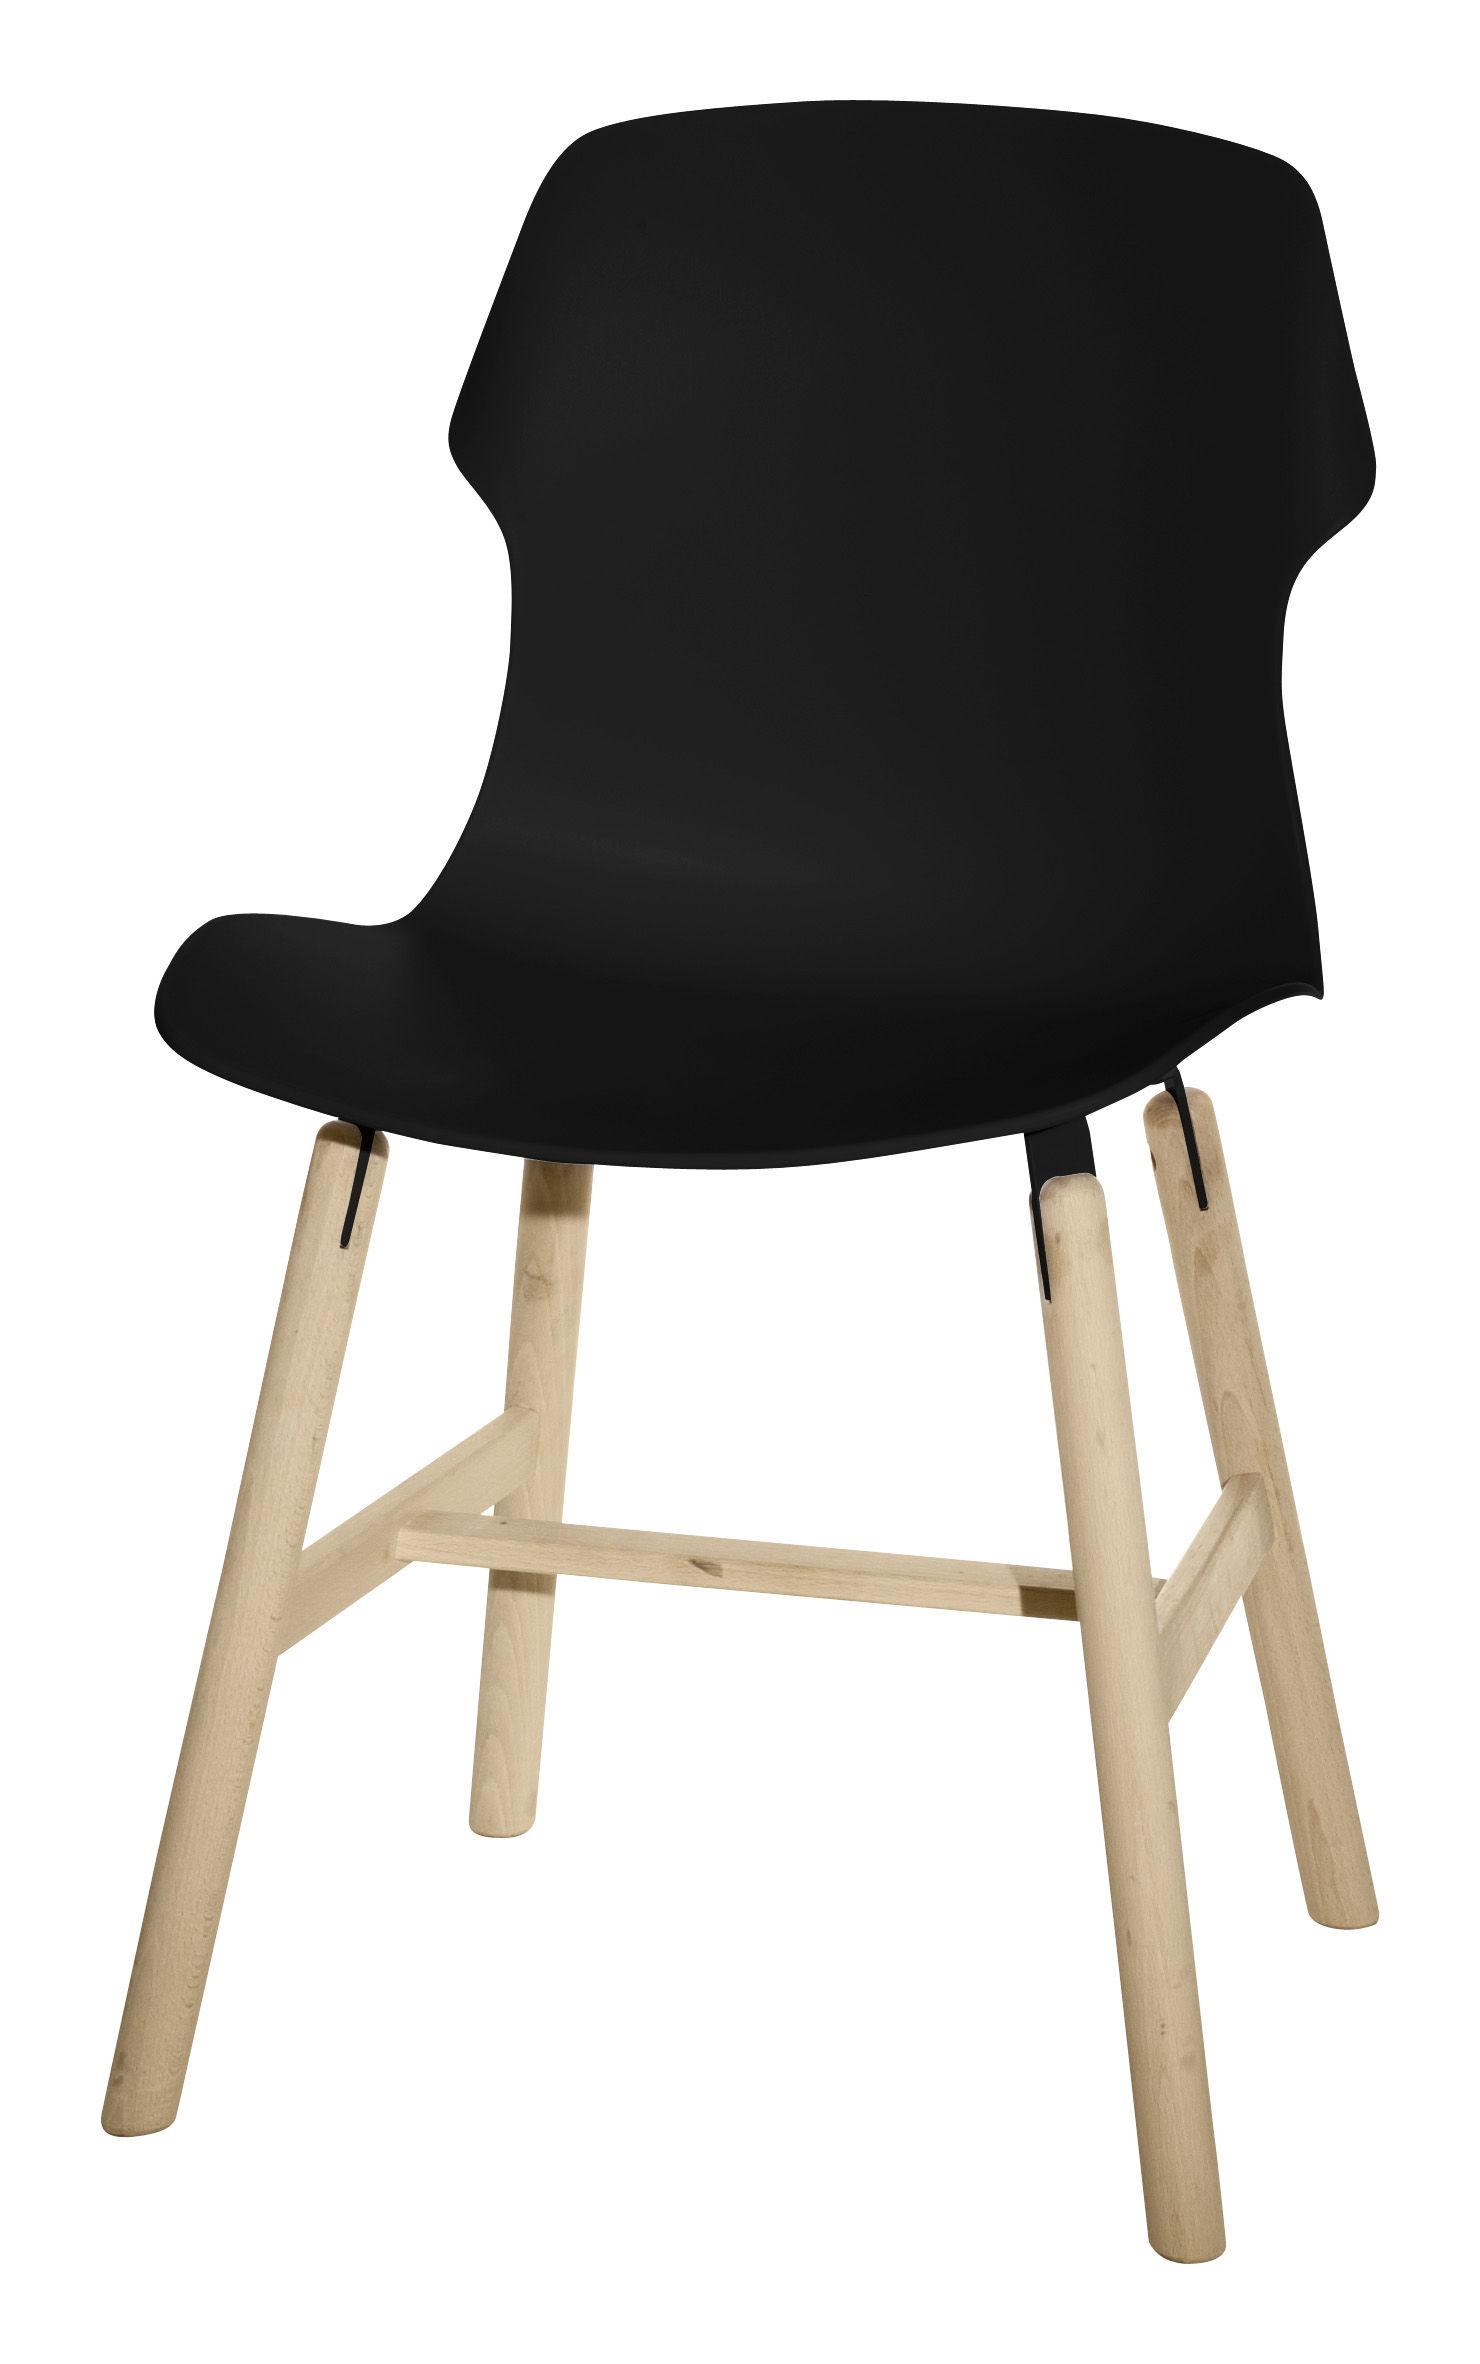 stereo wood 4 stuhlbeine aus holz casamania stuhl. Black Bedroom Furniture Sets. Home Design Ideas